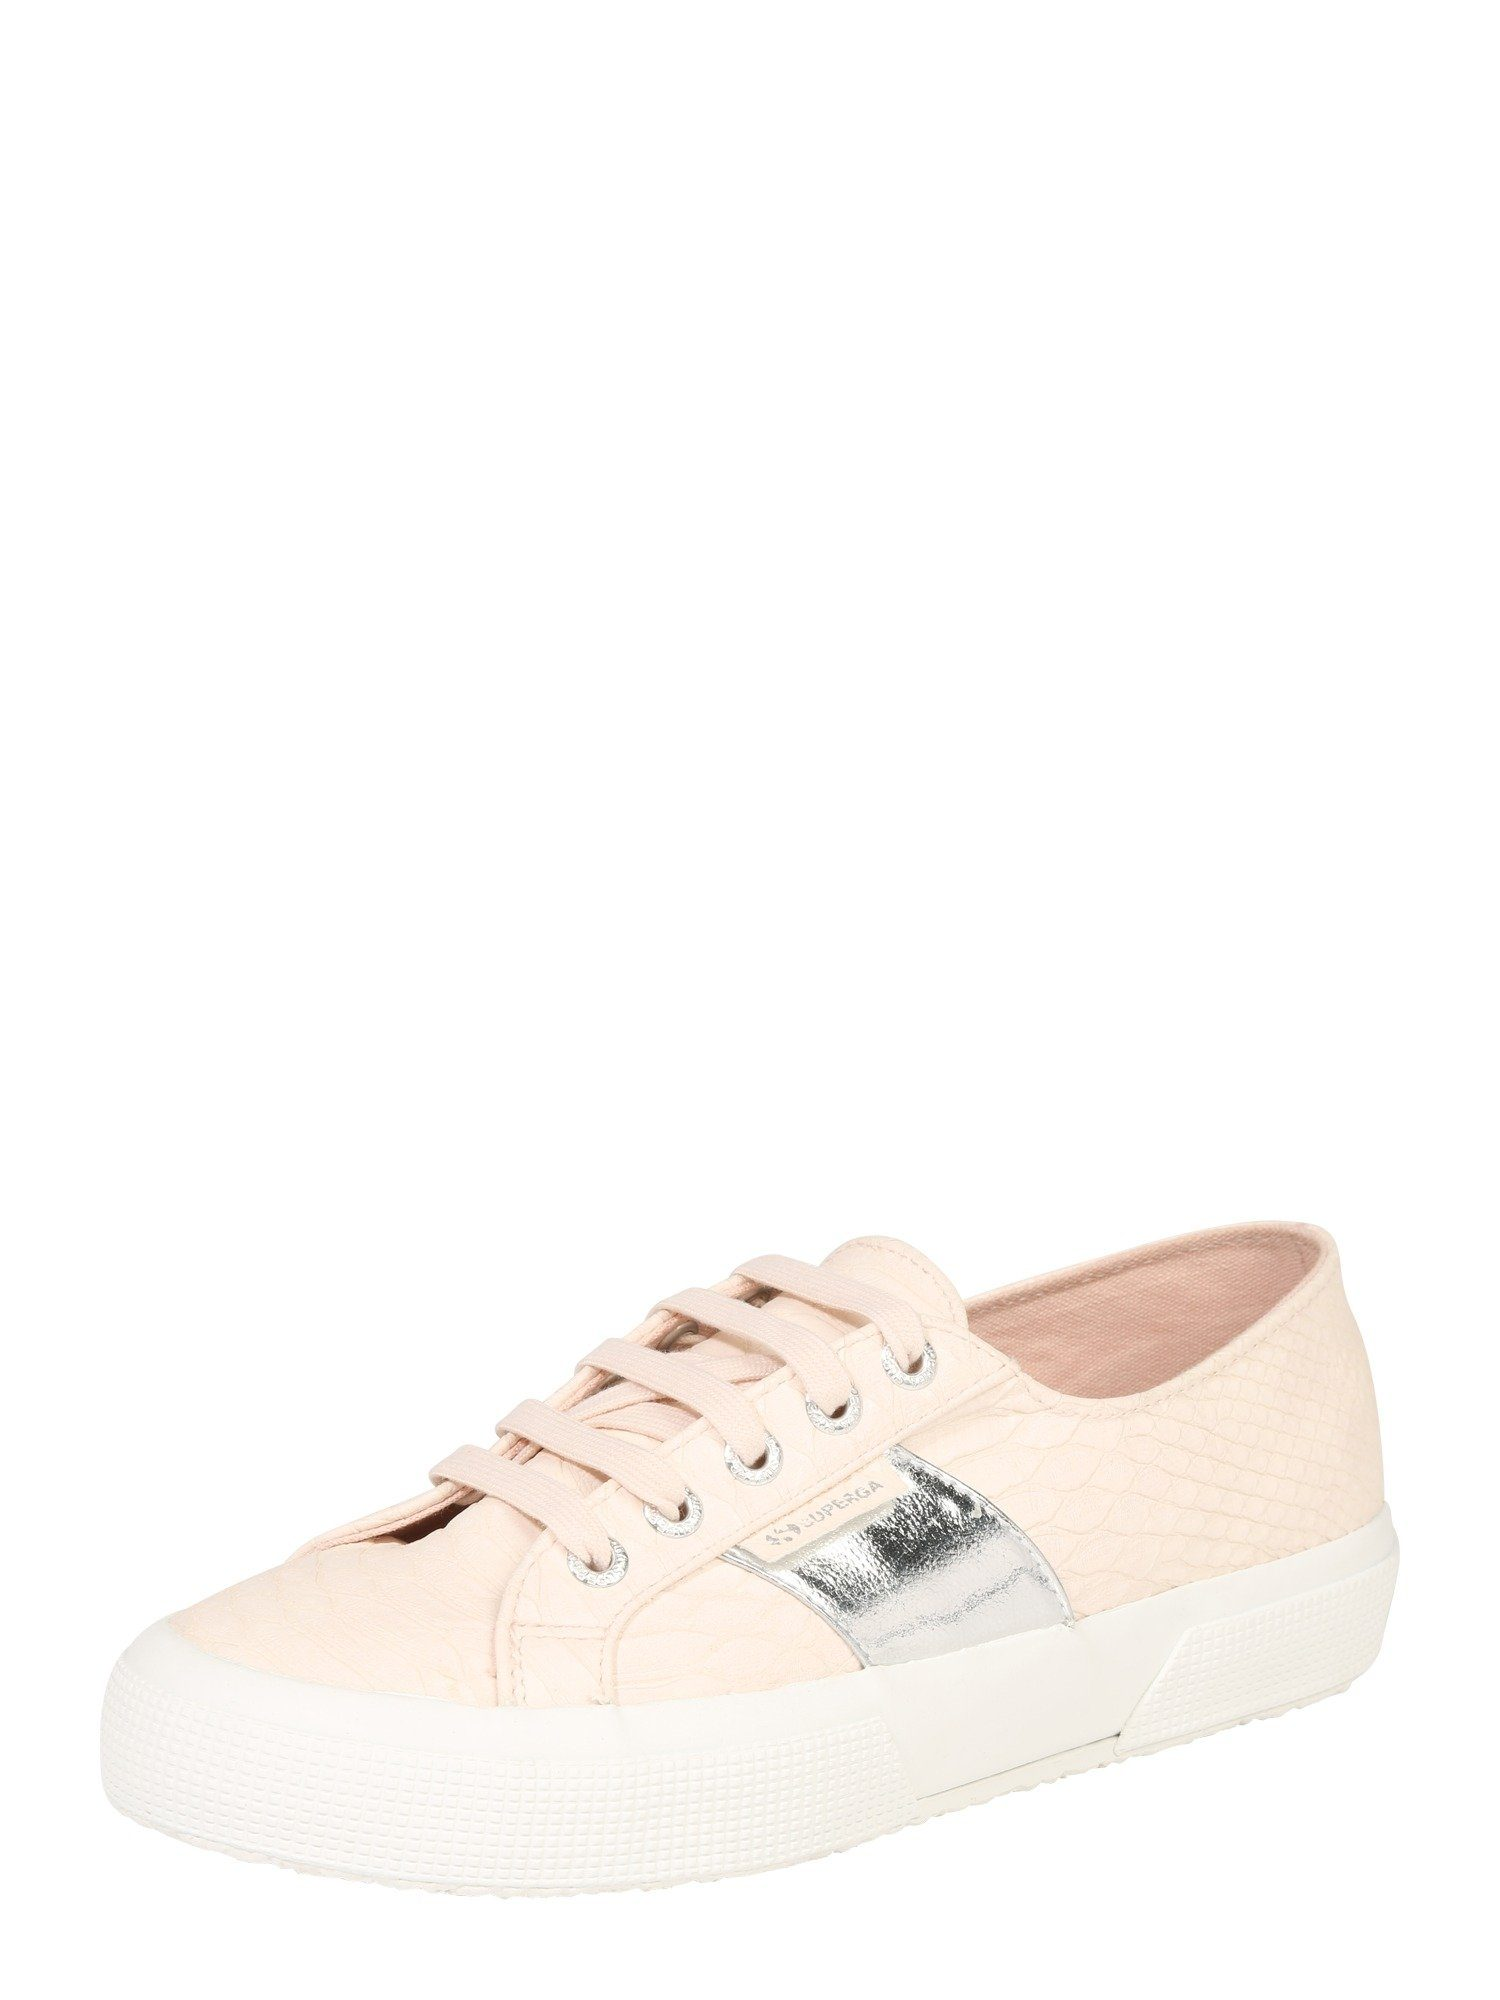 Superga Pusnakew Sneaker online kaufen  rosa